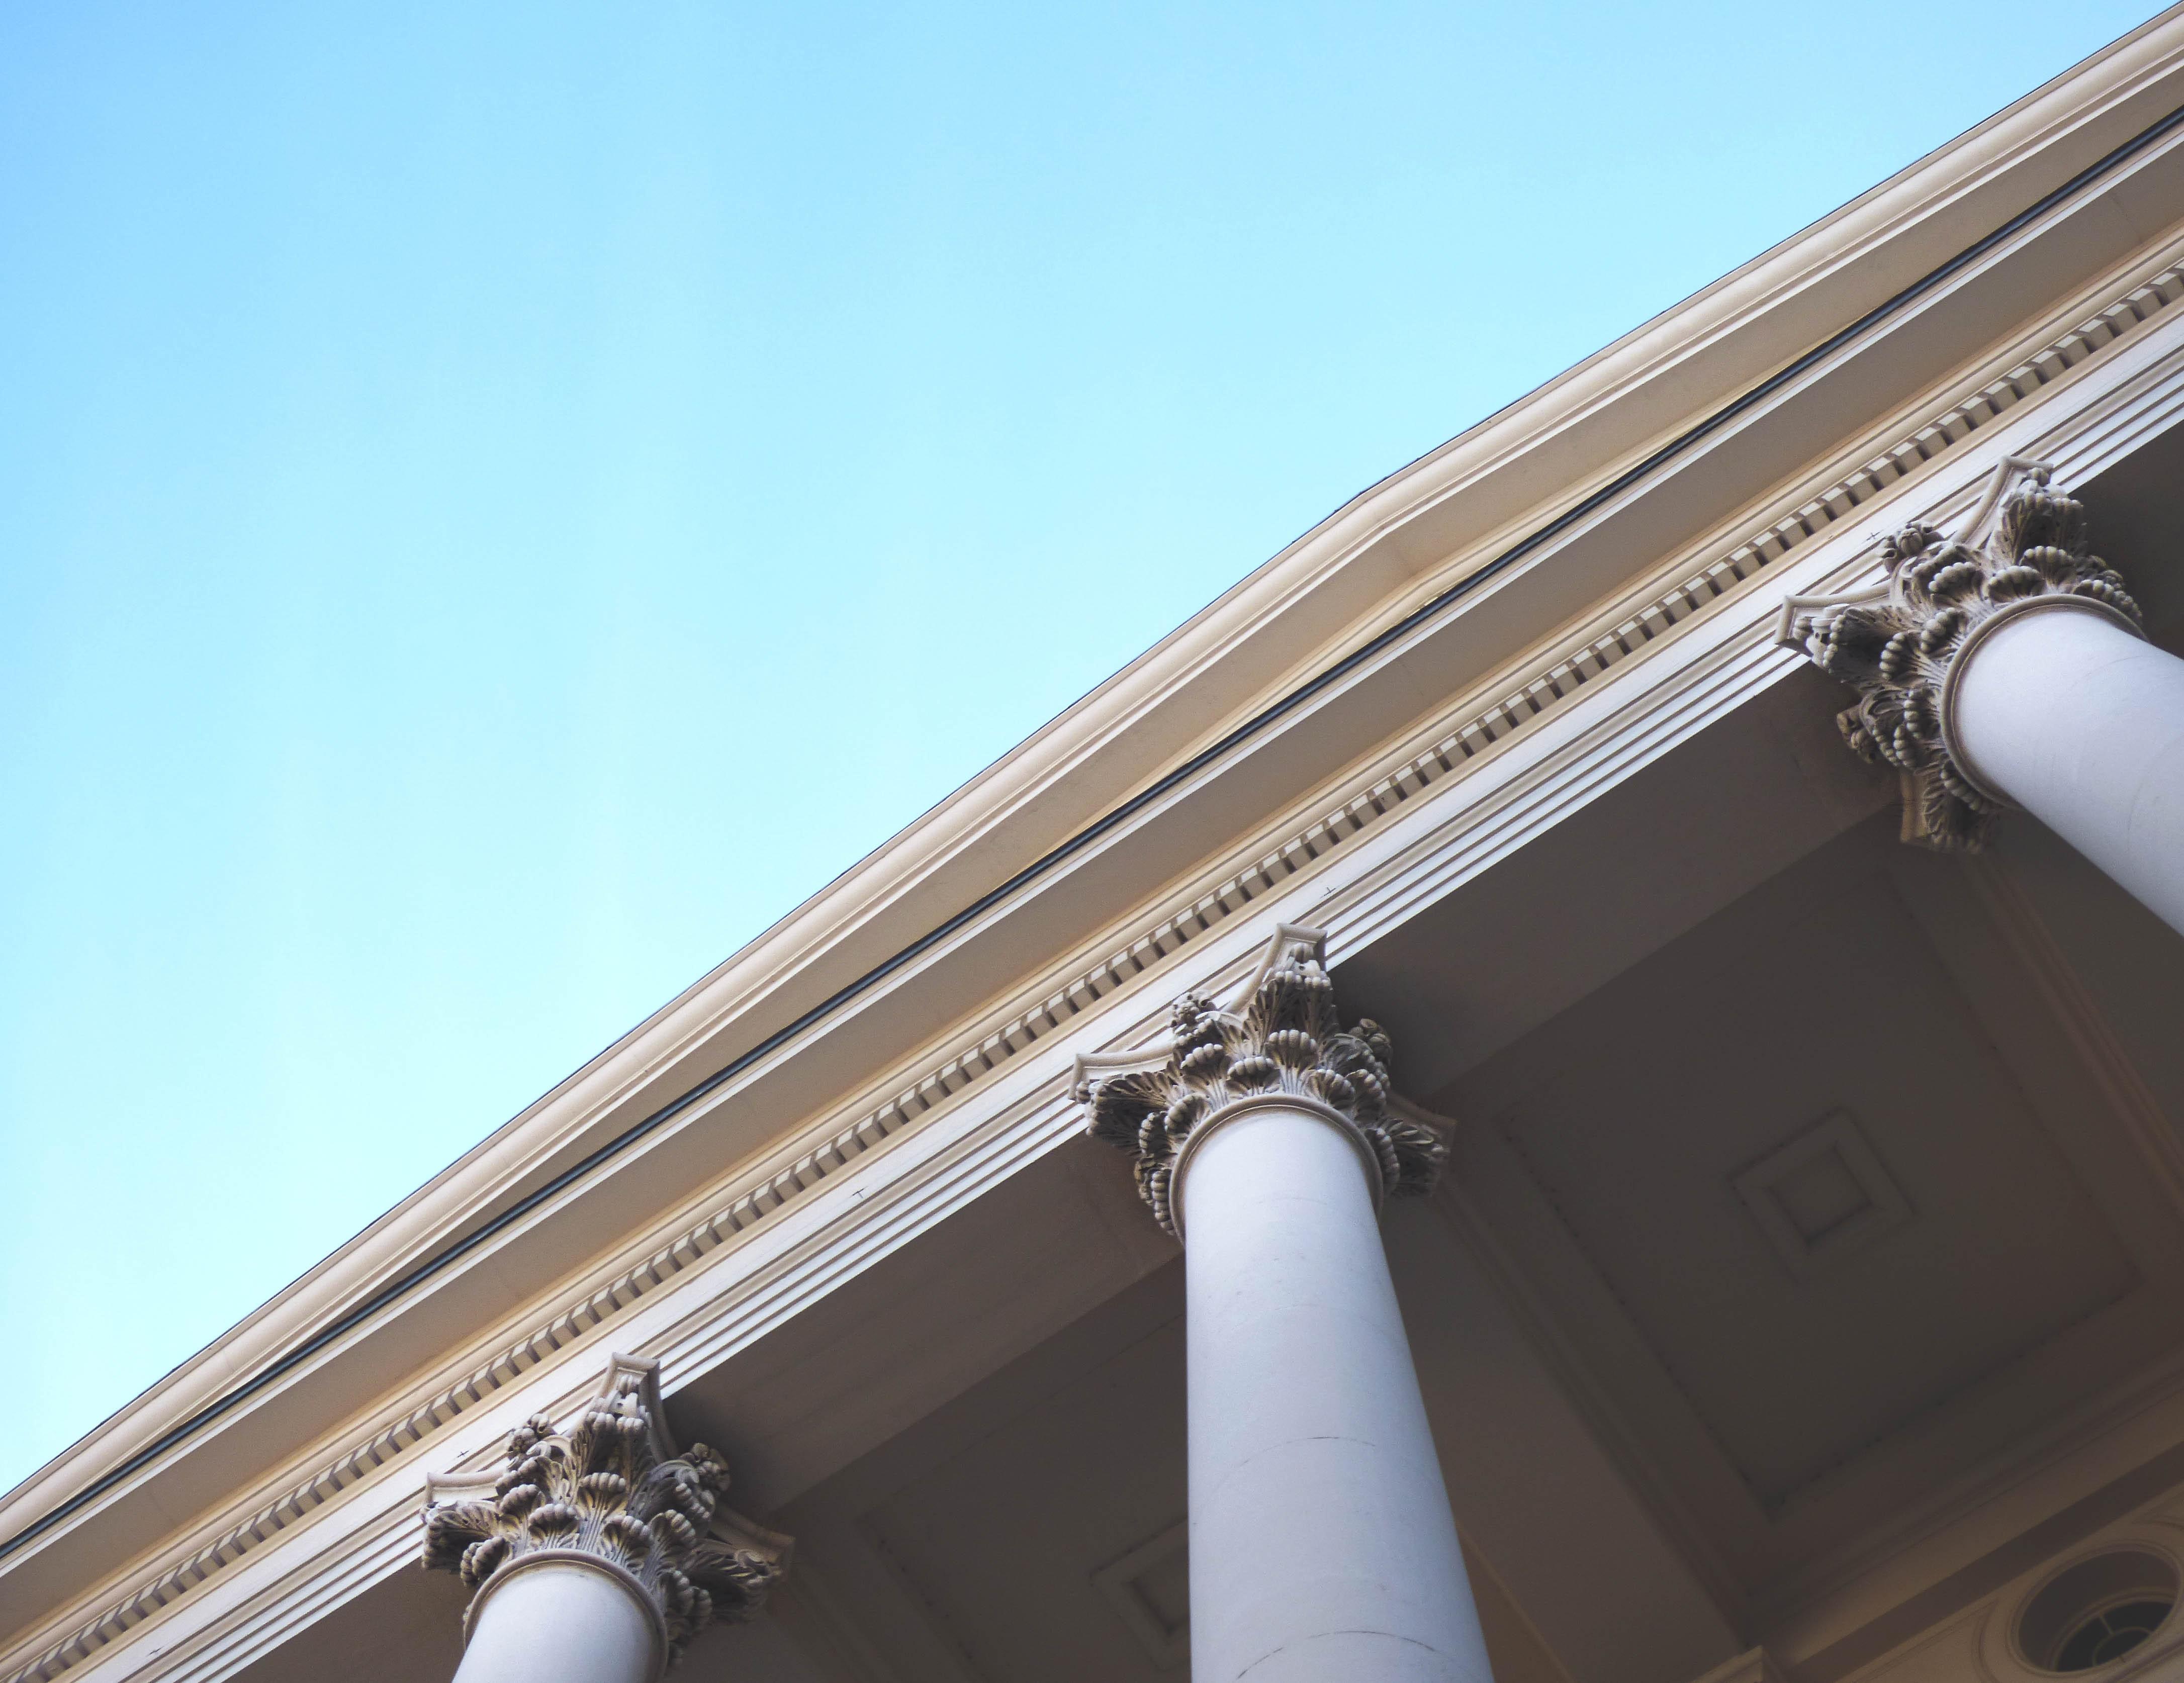 White Painted Pillars, Architectural design, Architecture, Blue sky, Building, HQ Photo